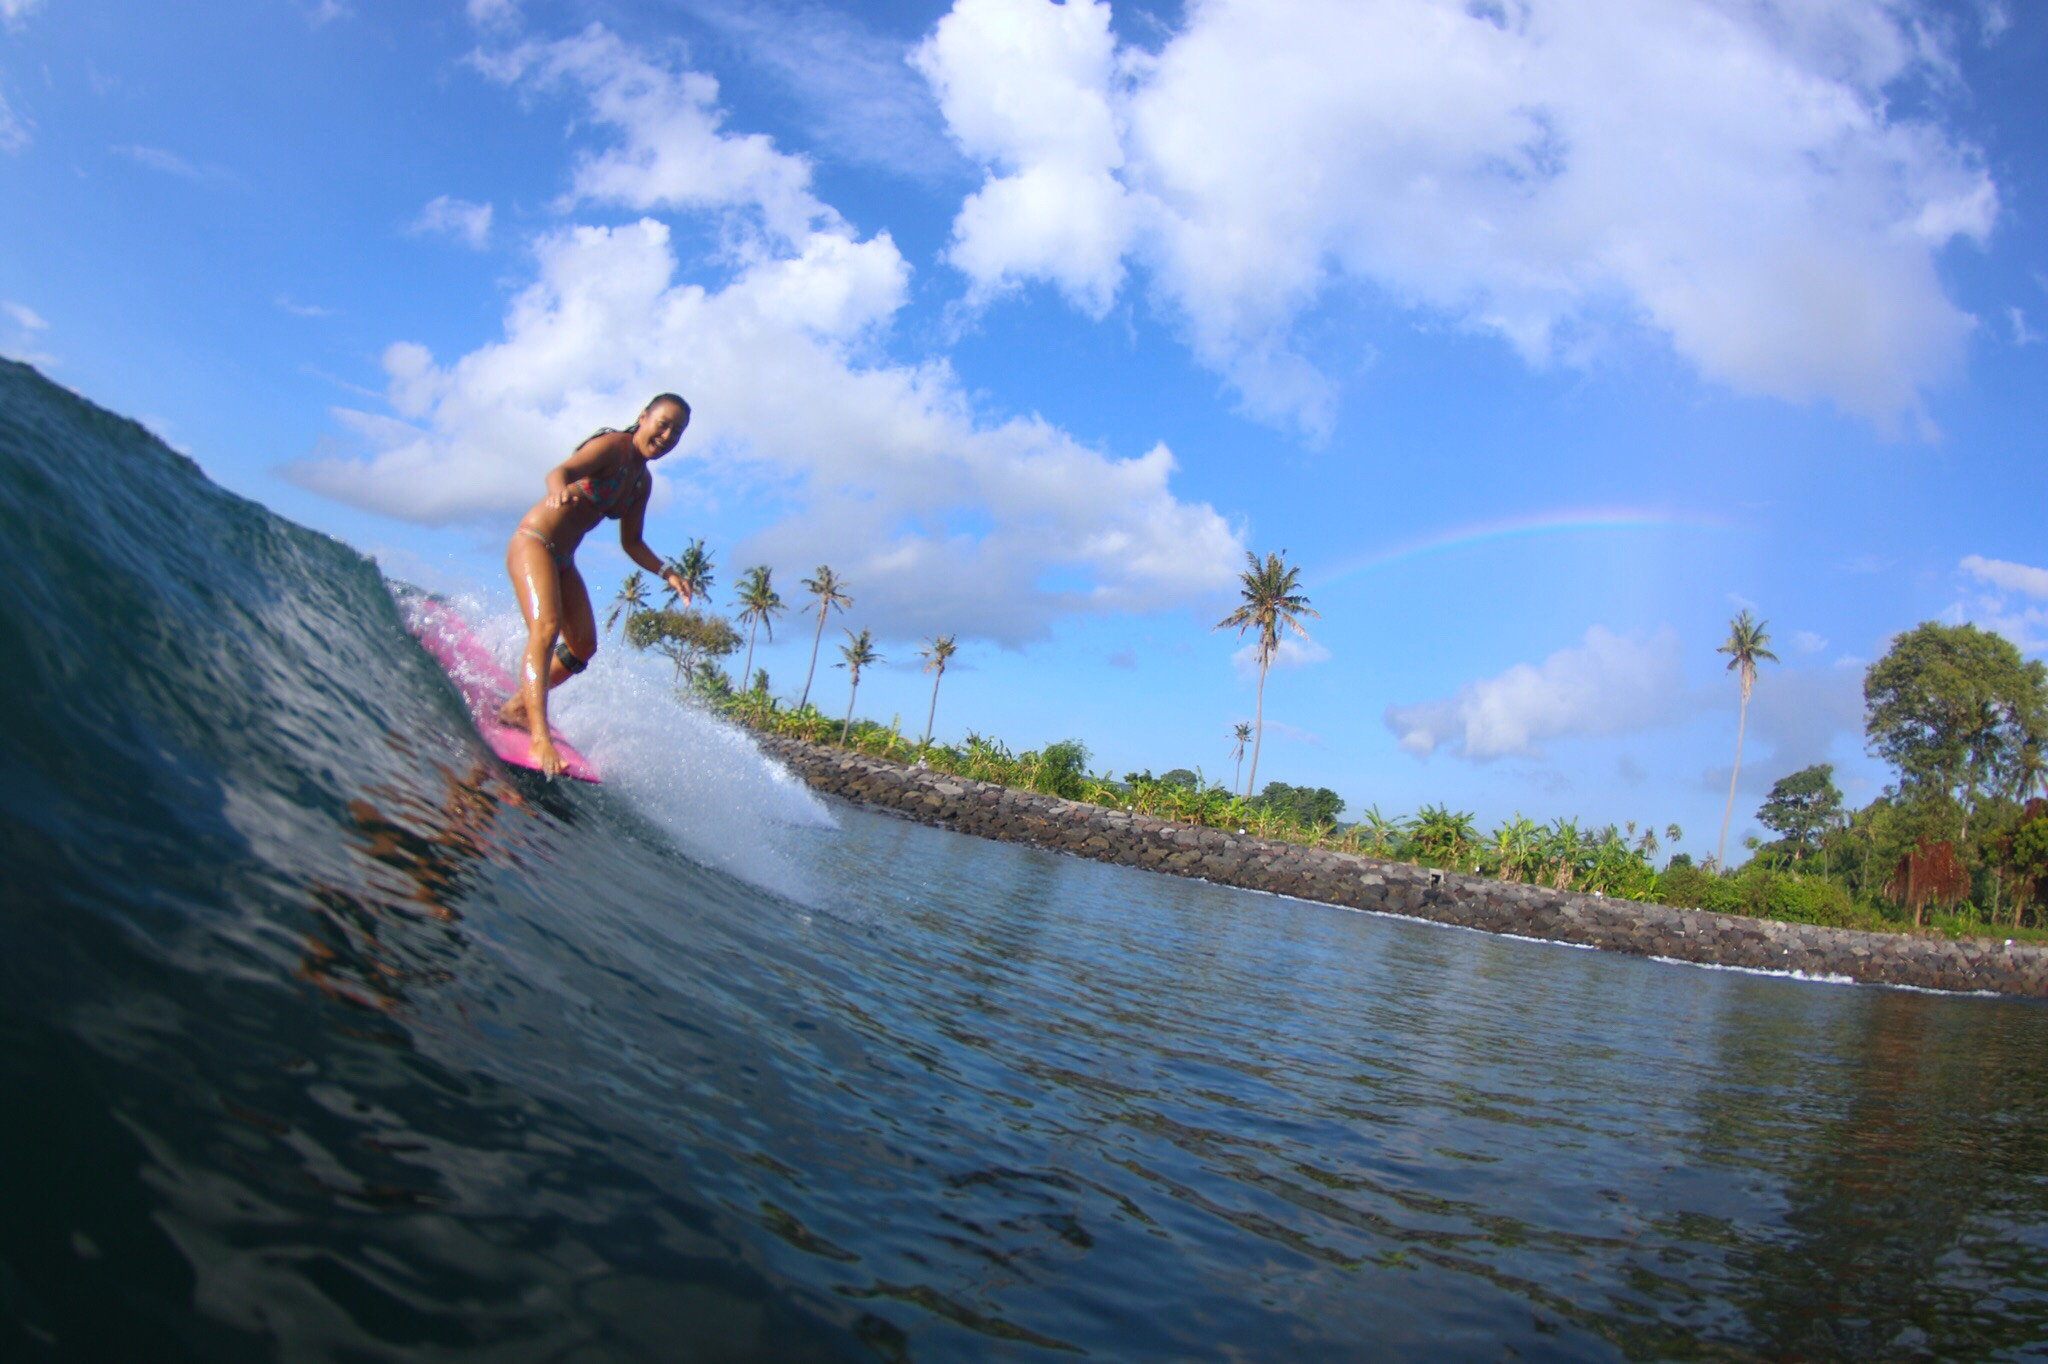 Hawaiian style surfing ☆Miku Uemura@Bali